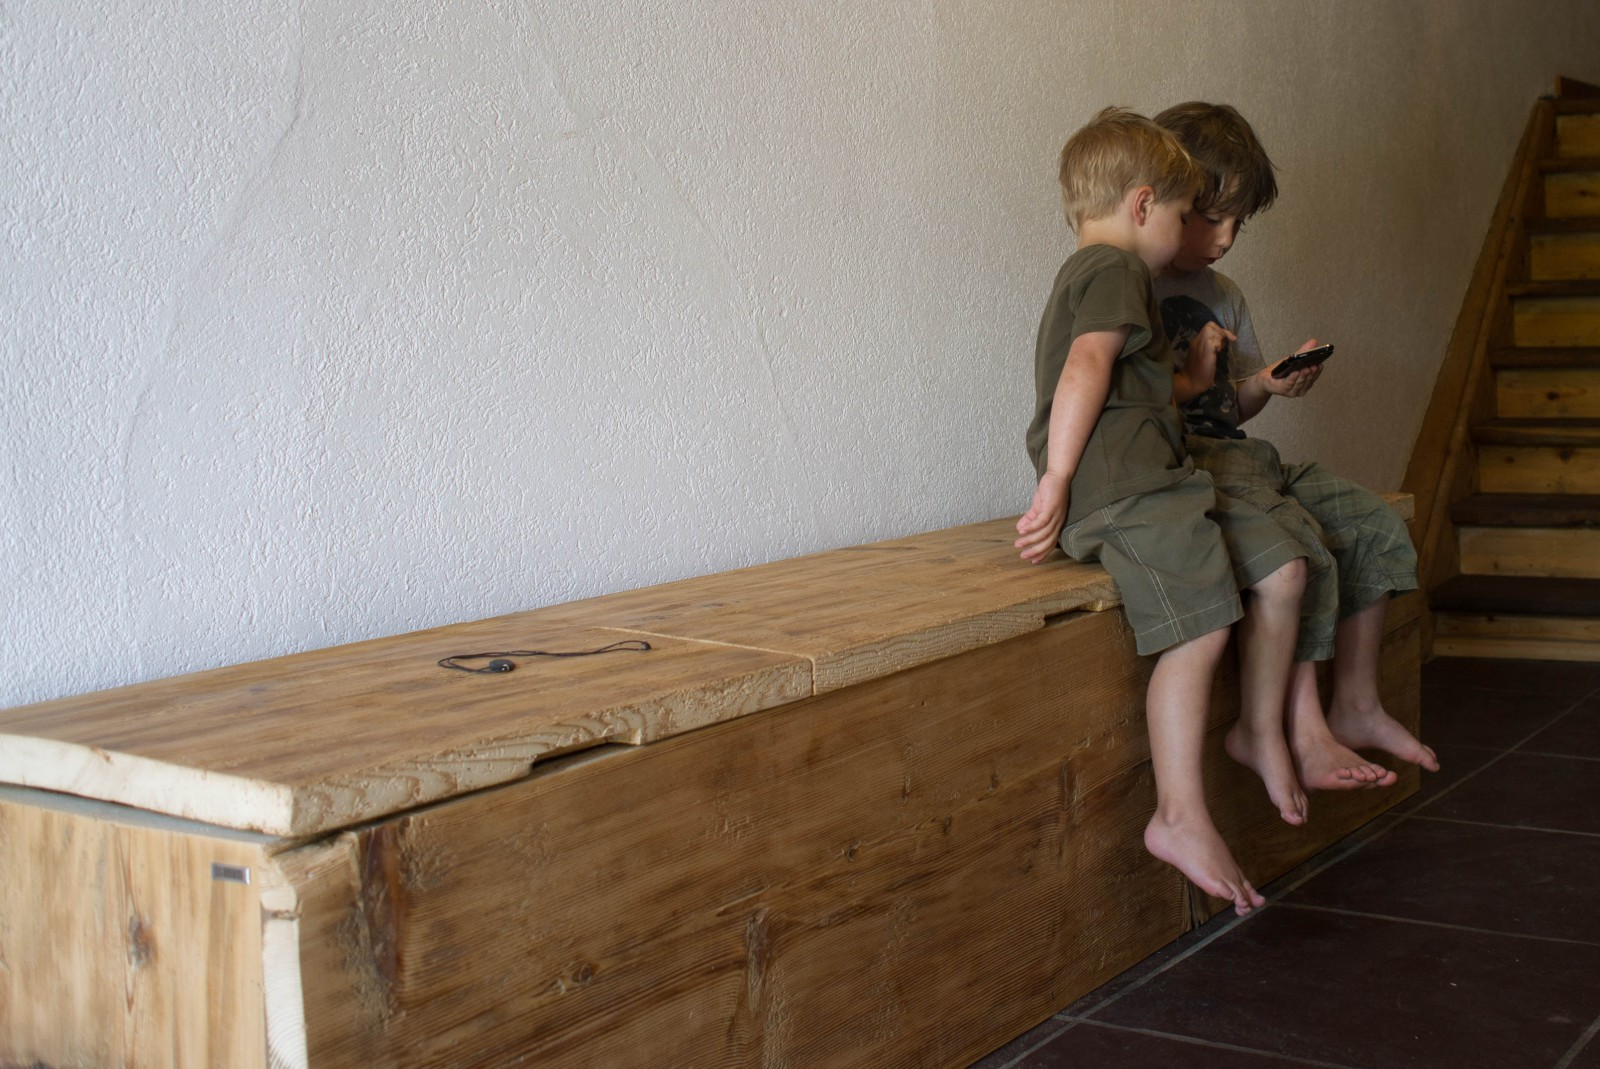 Manum – Möbel aus Altholz – Garderobe aus Altholz / Flur